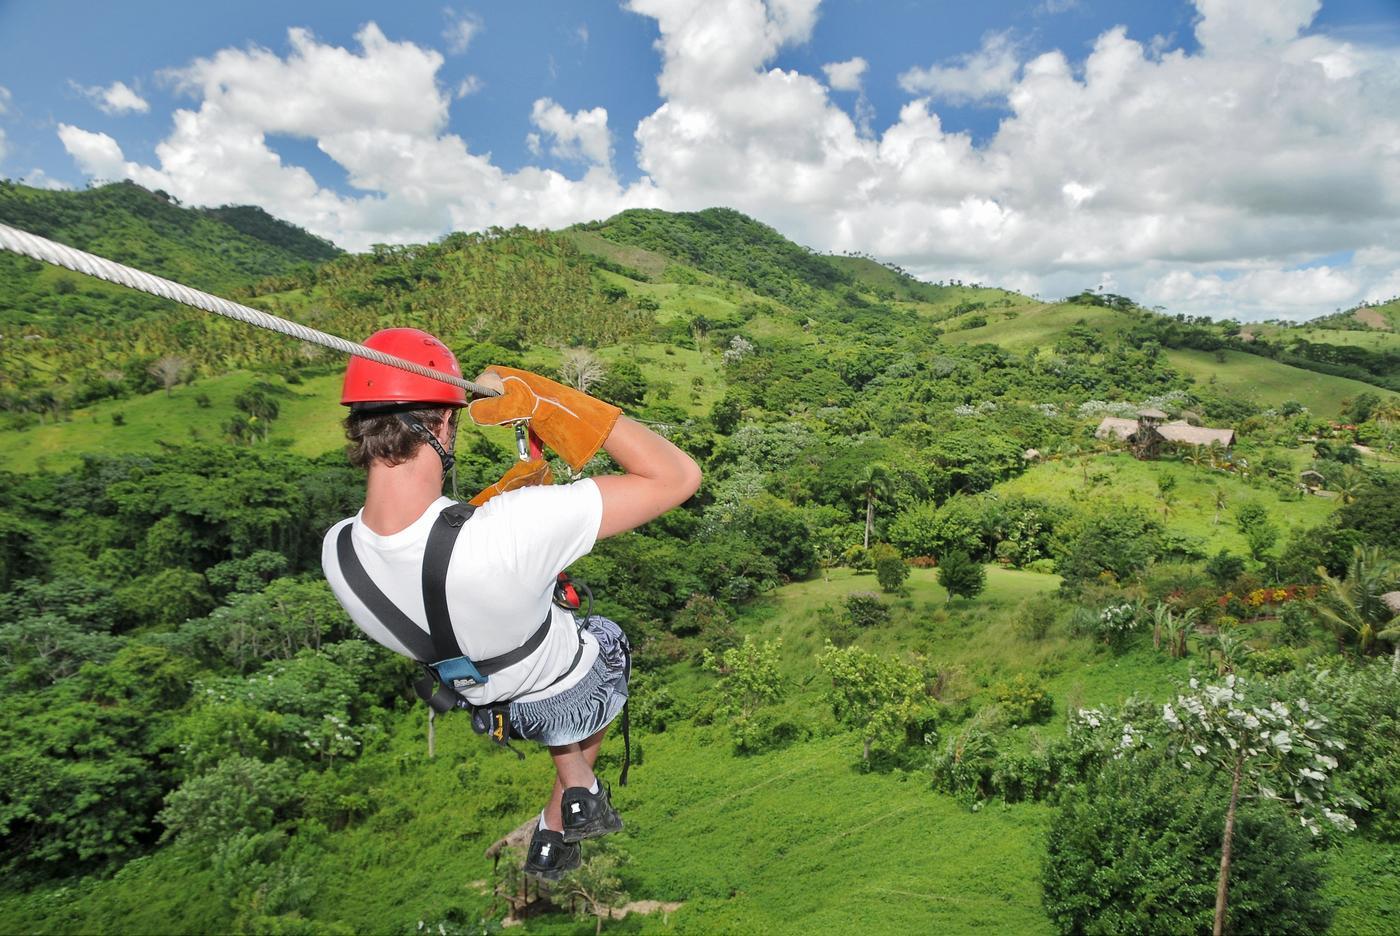 zip punta cana dominican republic line adventures ziplining tours zipline ziplines lines adventure canopy tour caribbean runners puntacana bavaro activities